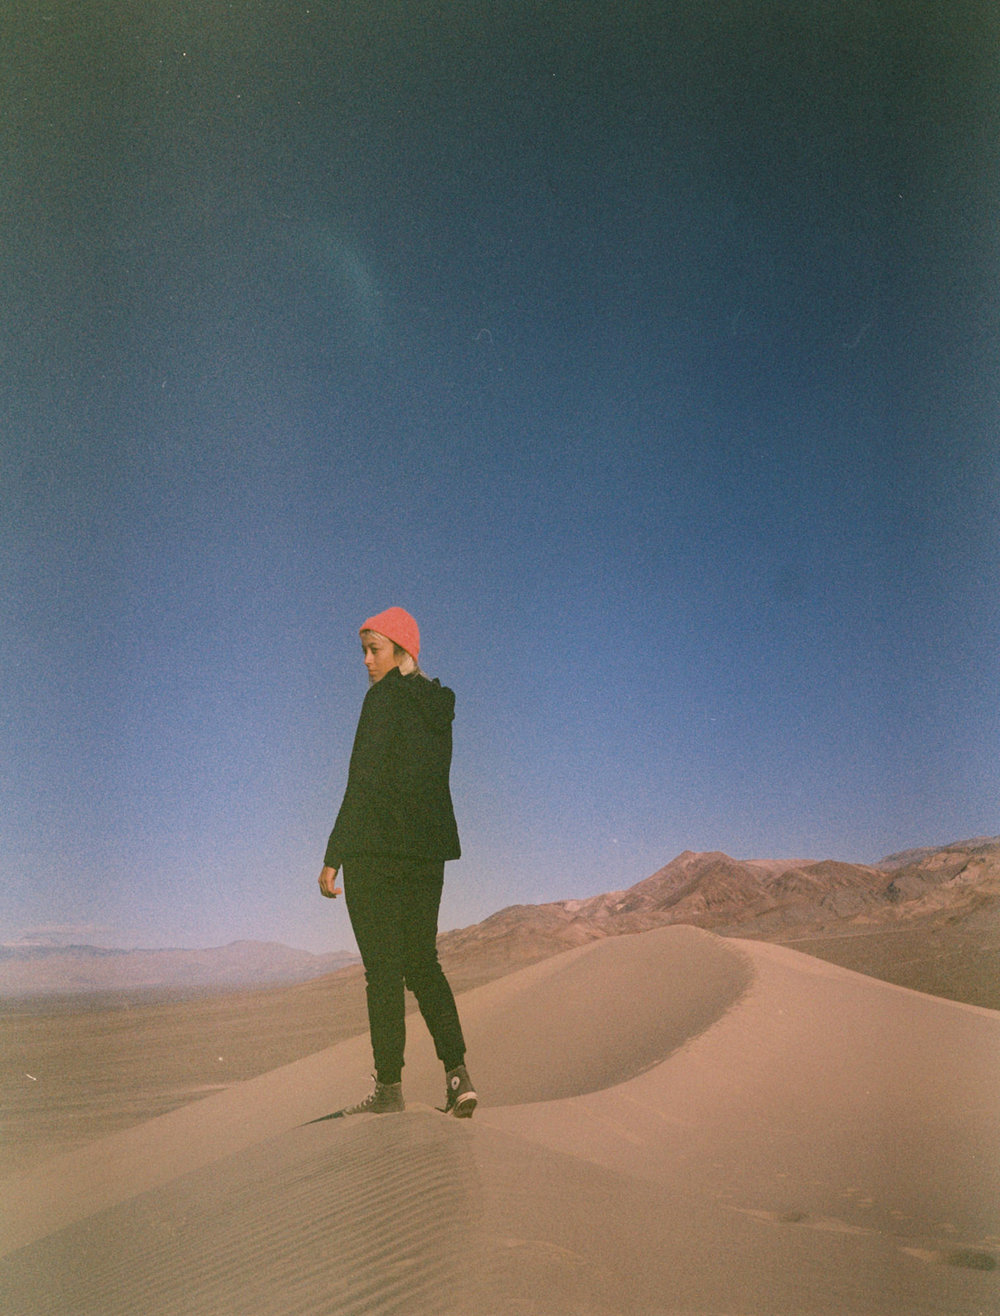 desert-camping-fujiGA645zi-1.jpg